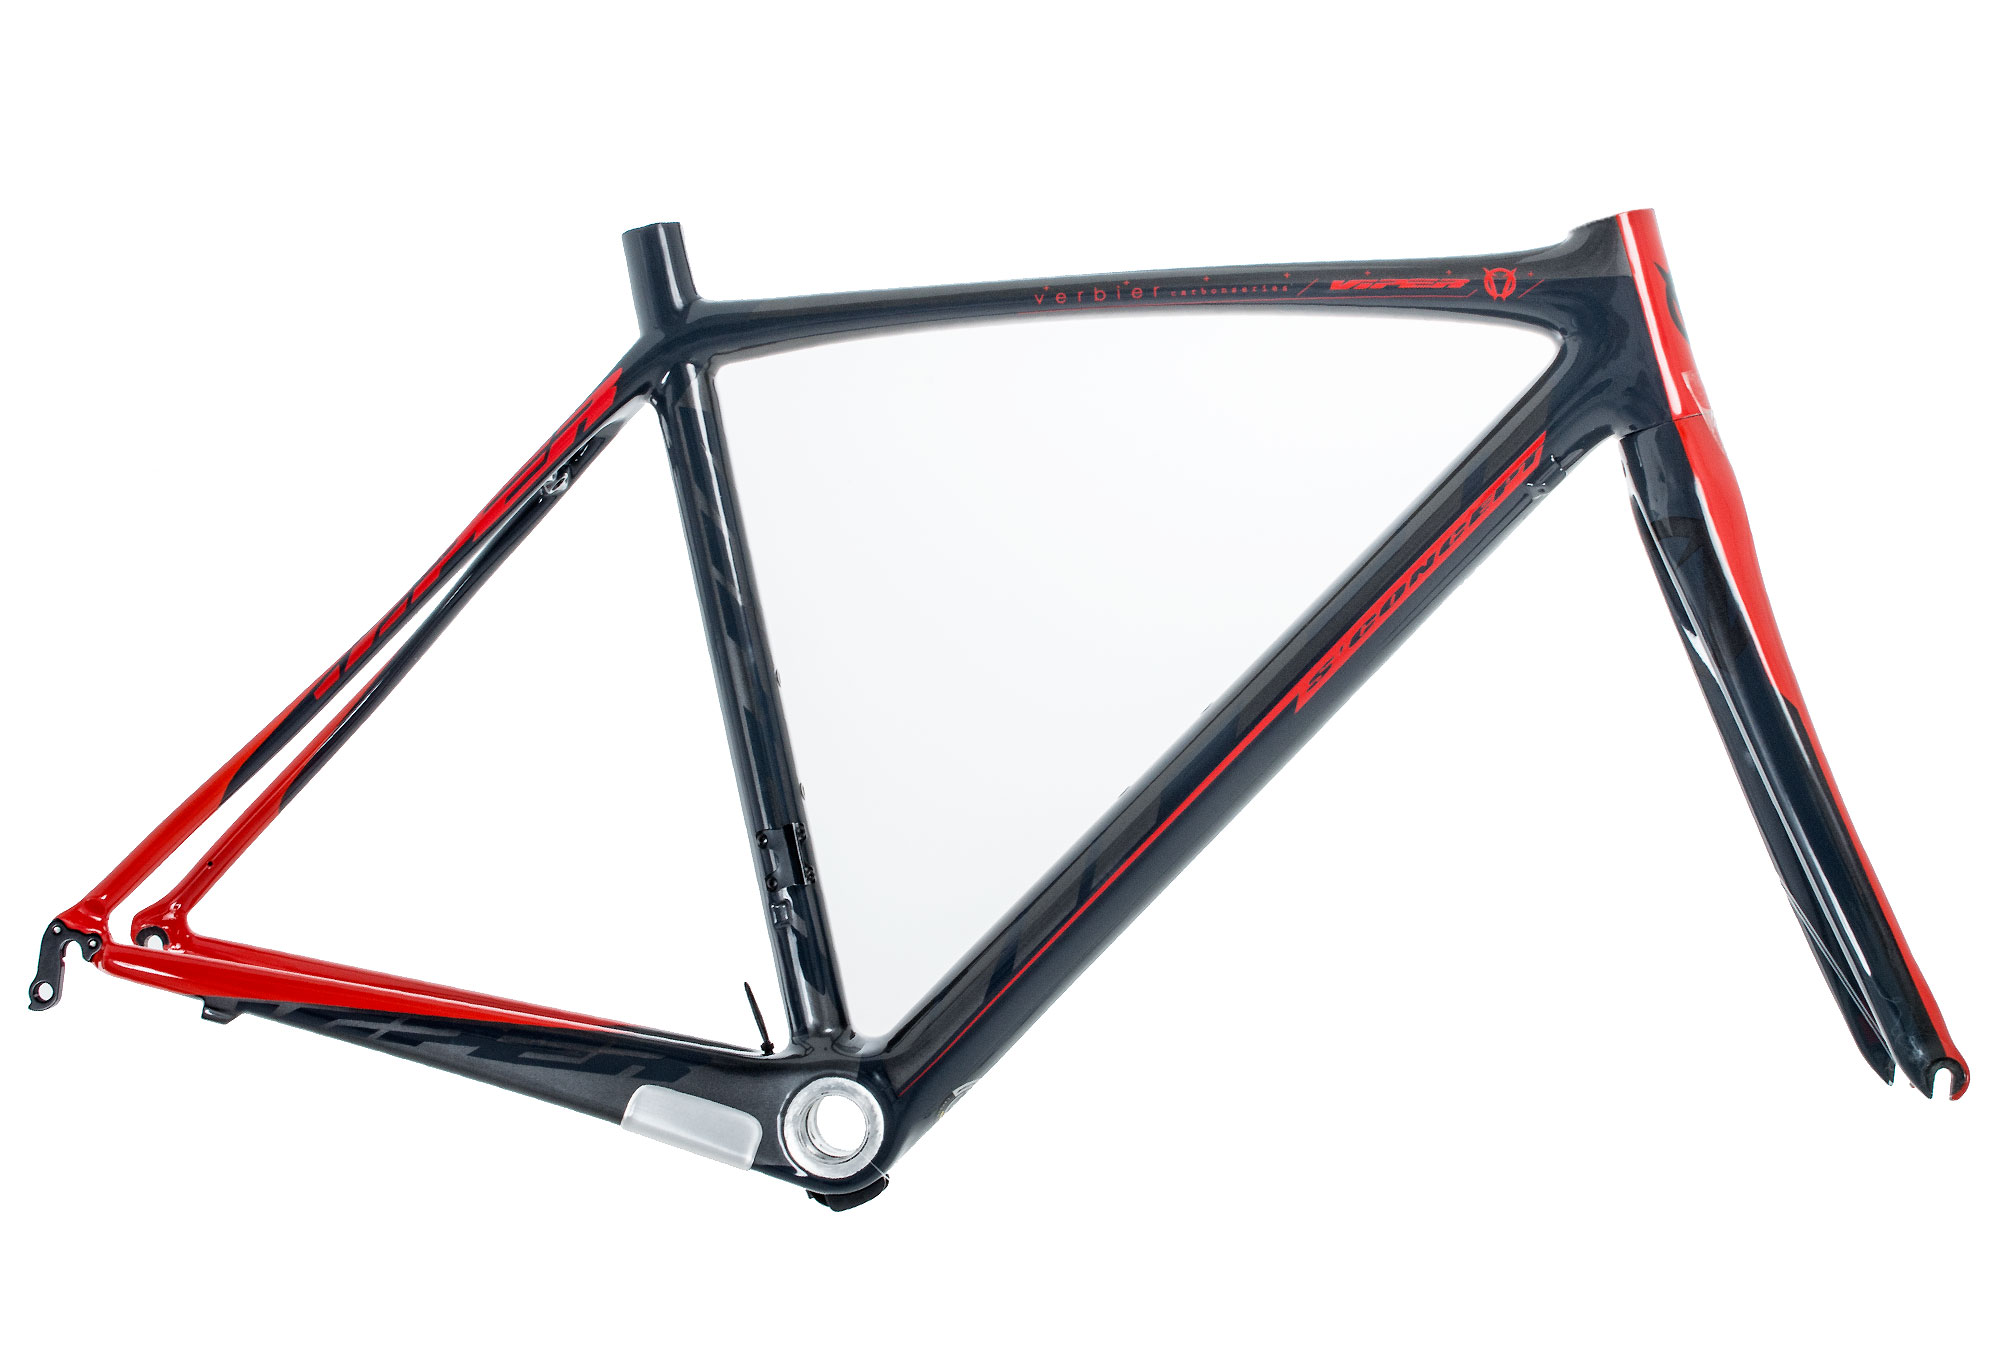 Rennrad Rahmen-Kit VIPER Verbier - grau / rot   Alltricks.de